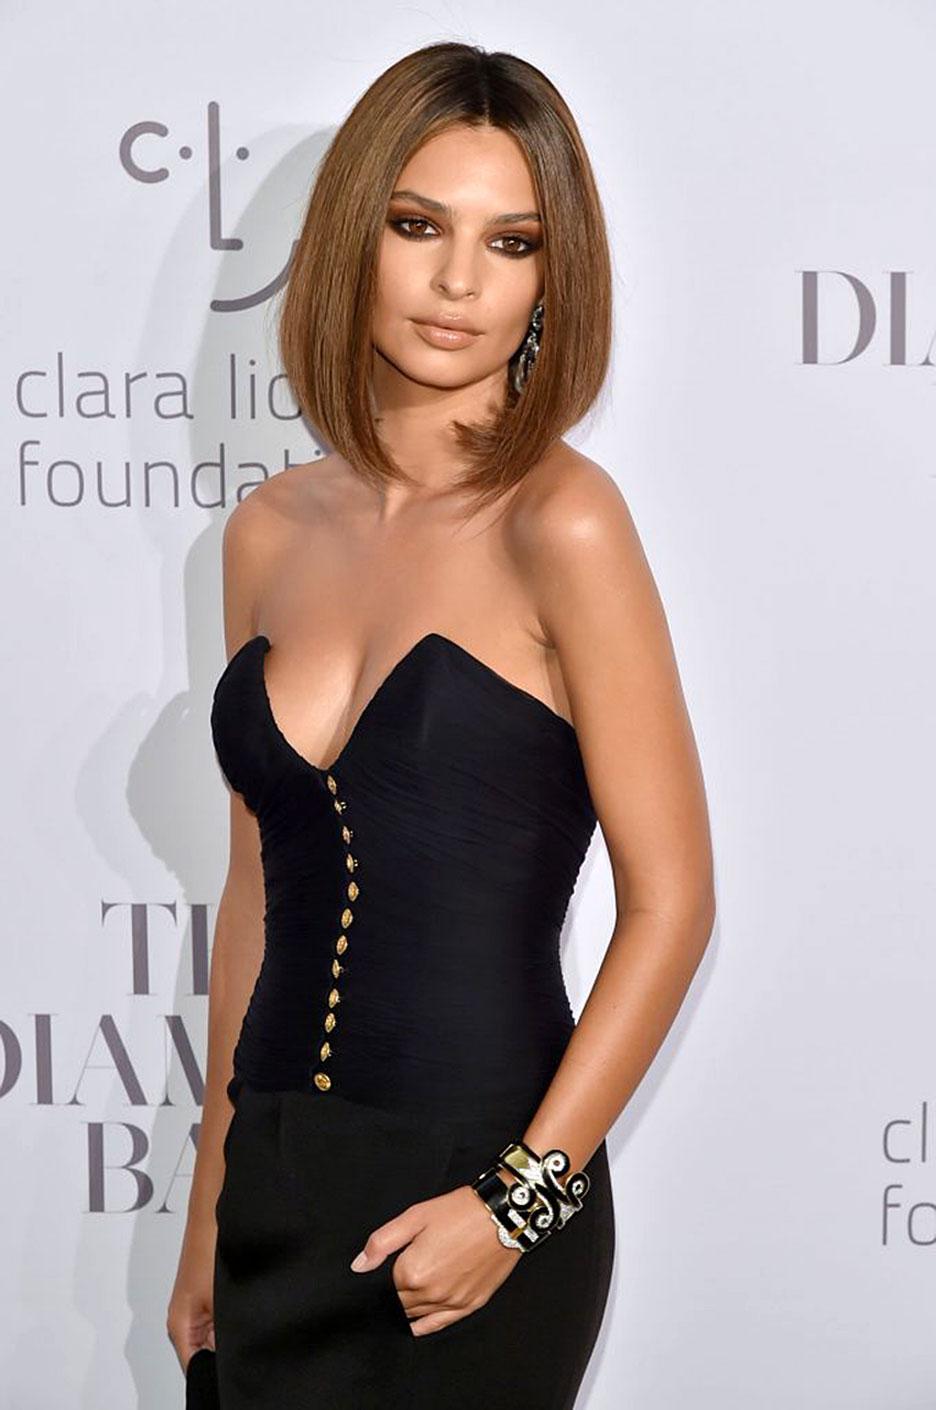 Emily ratajkowski adores topless plus deep cleavage pics - 2019 year